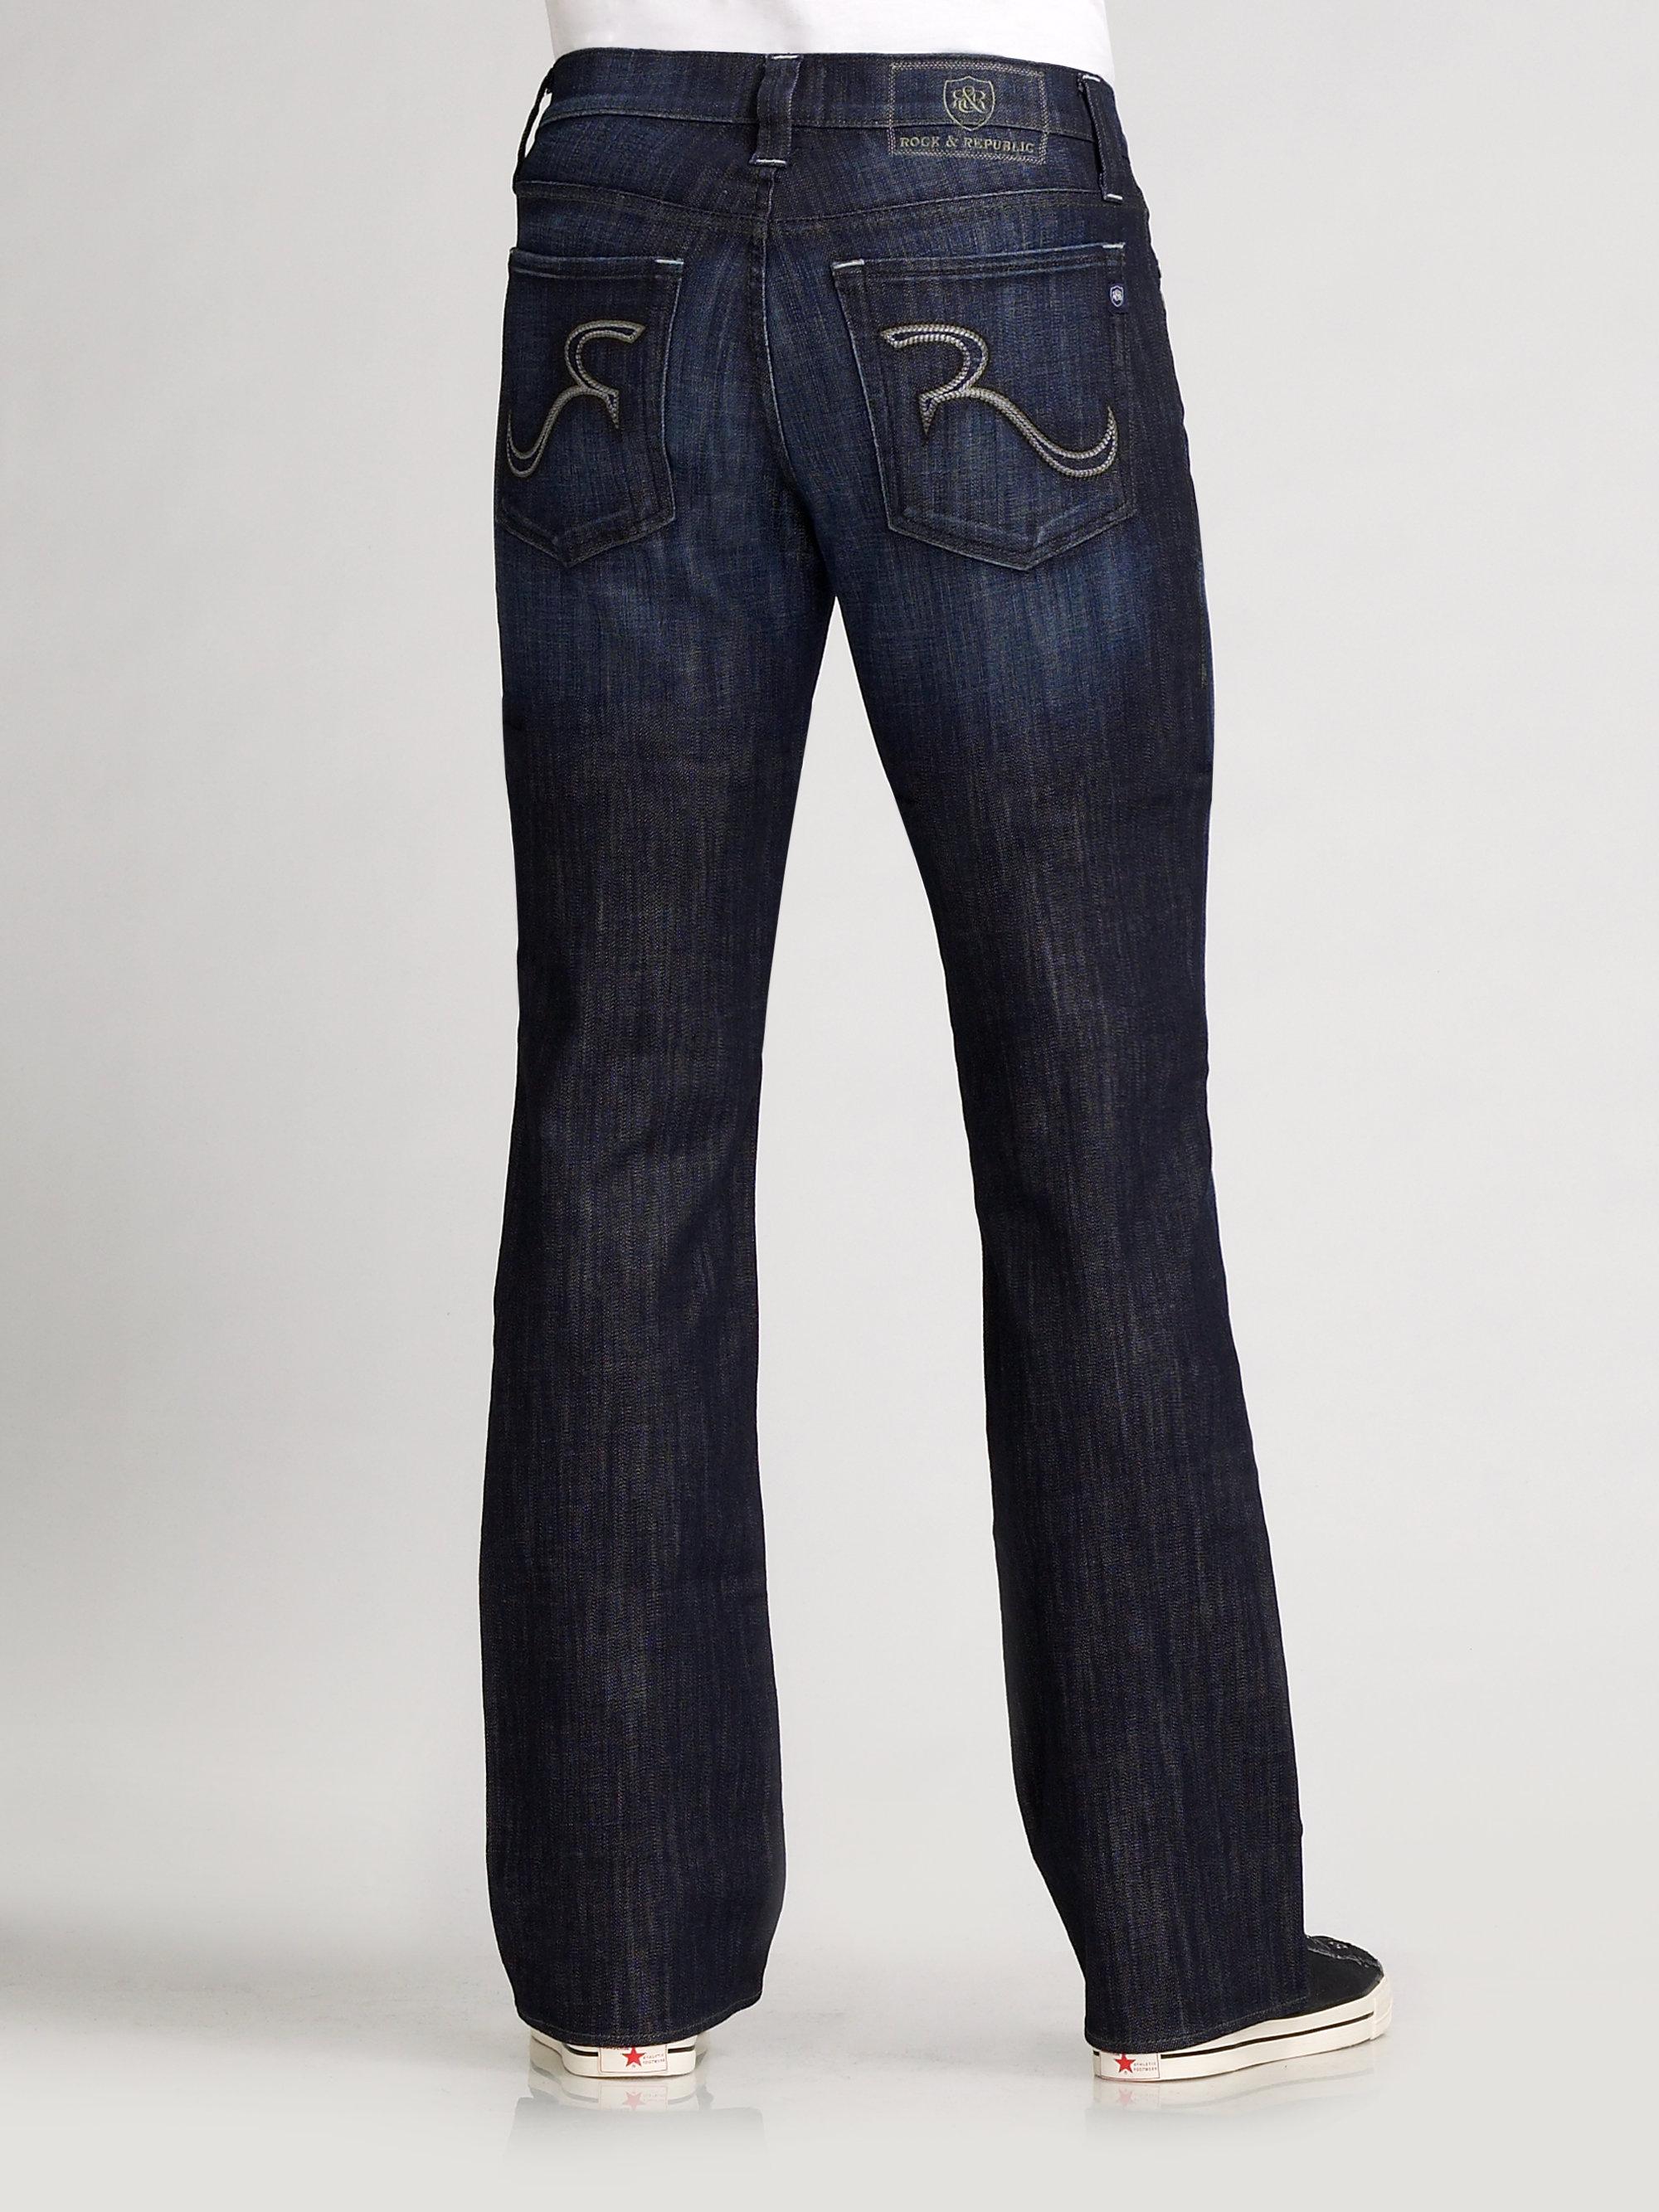 lyst rock republic henlee bootcut jeans in blue for men. Black Bedroom Furniture Sets. Home Design Ideas